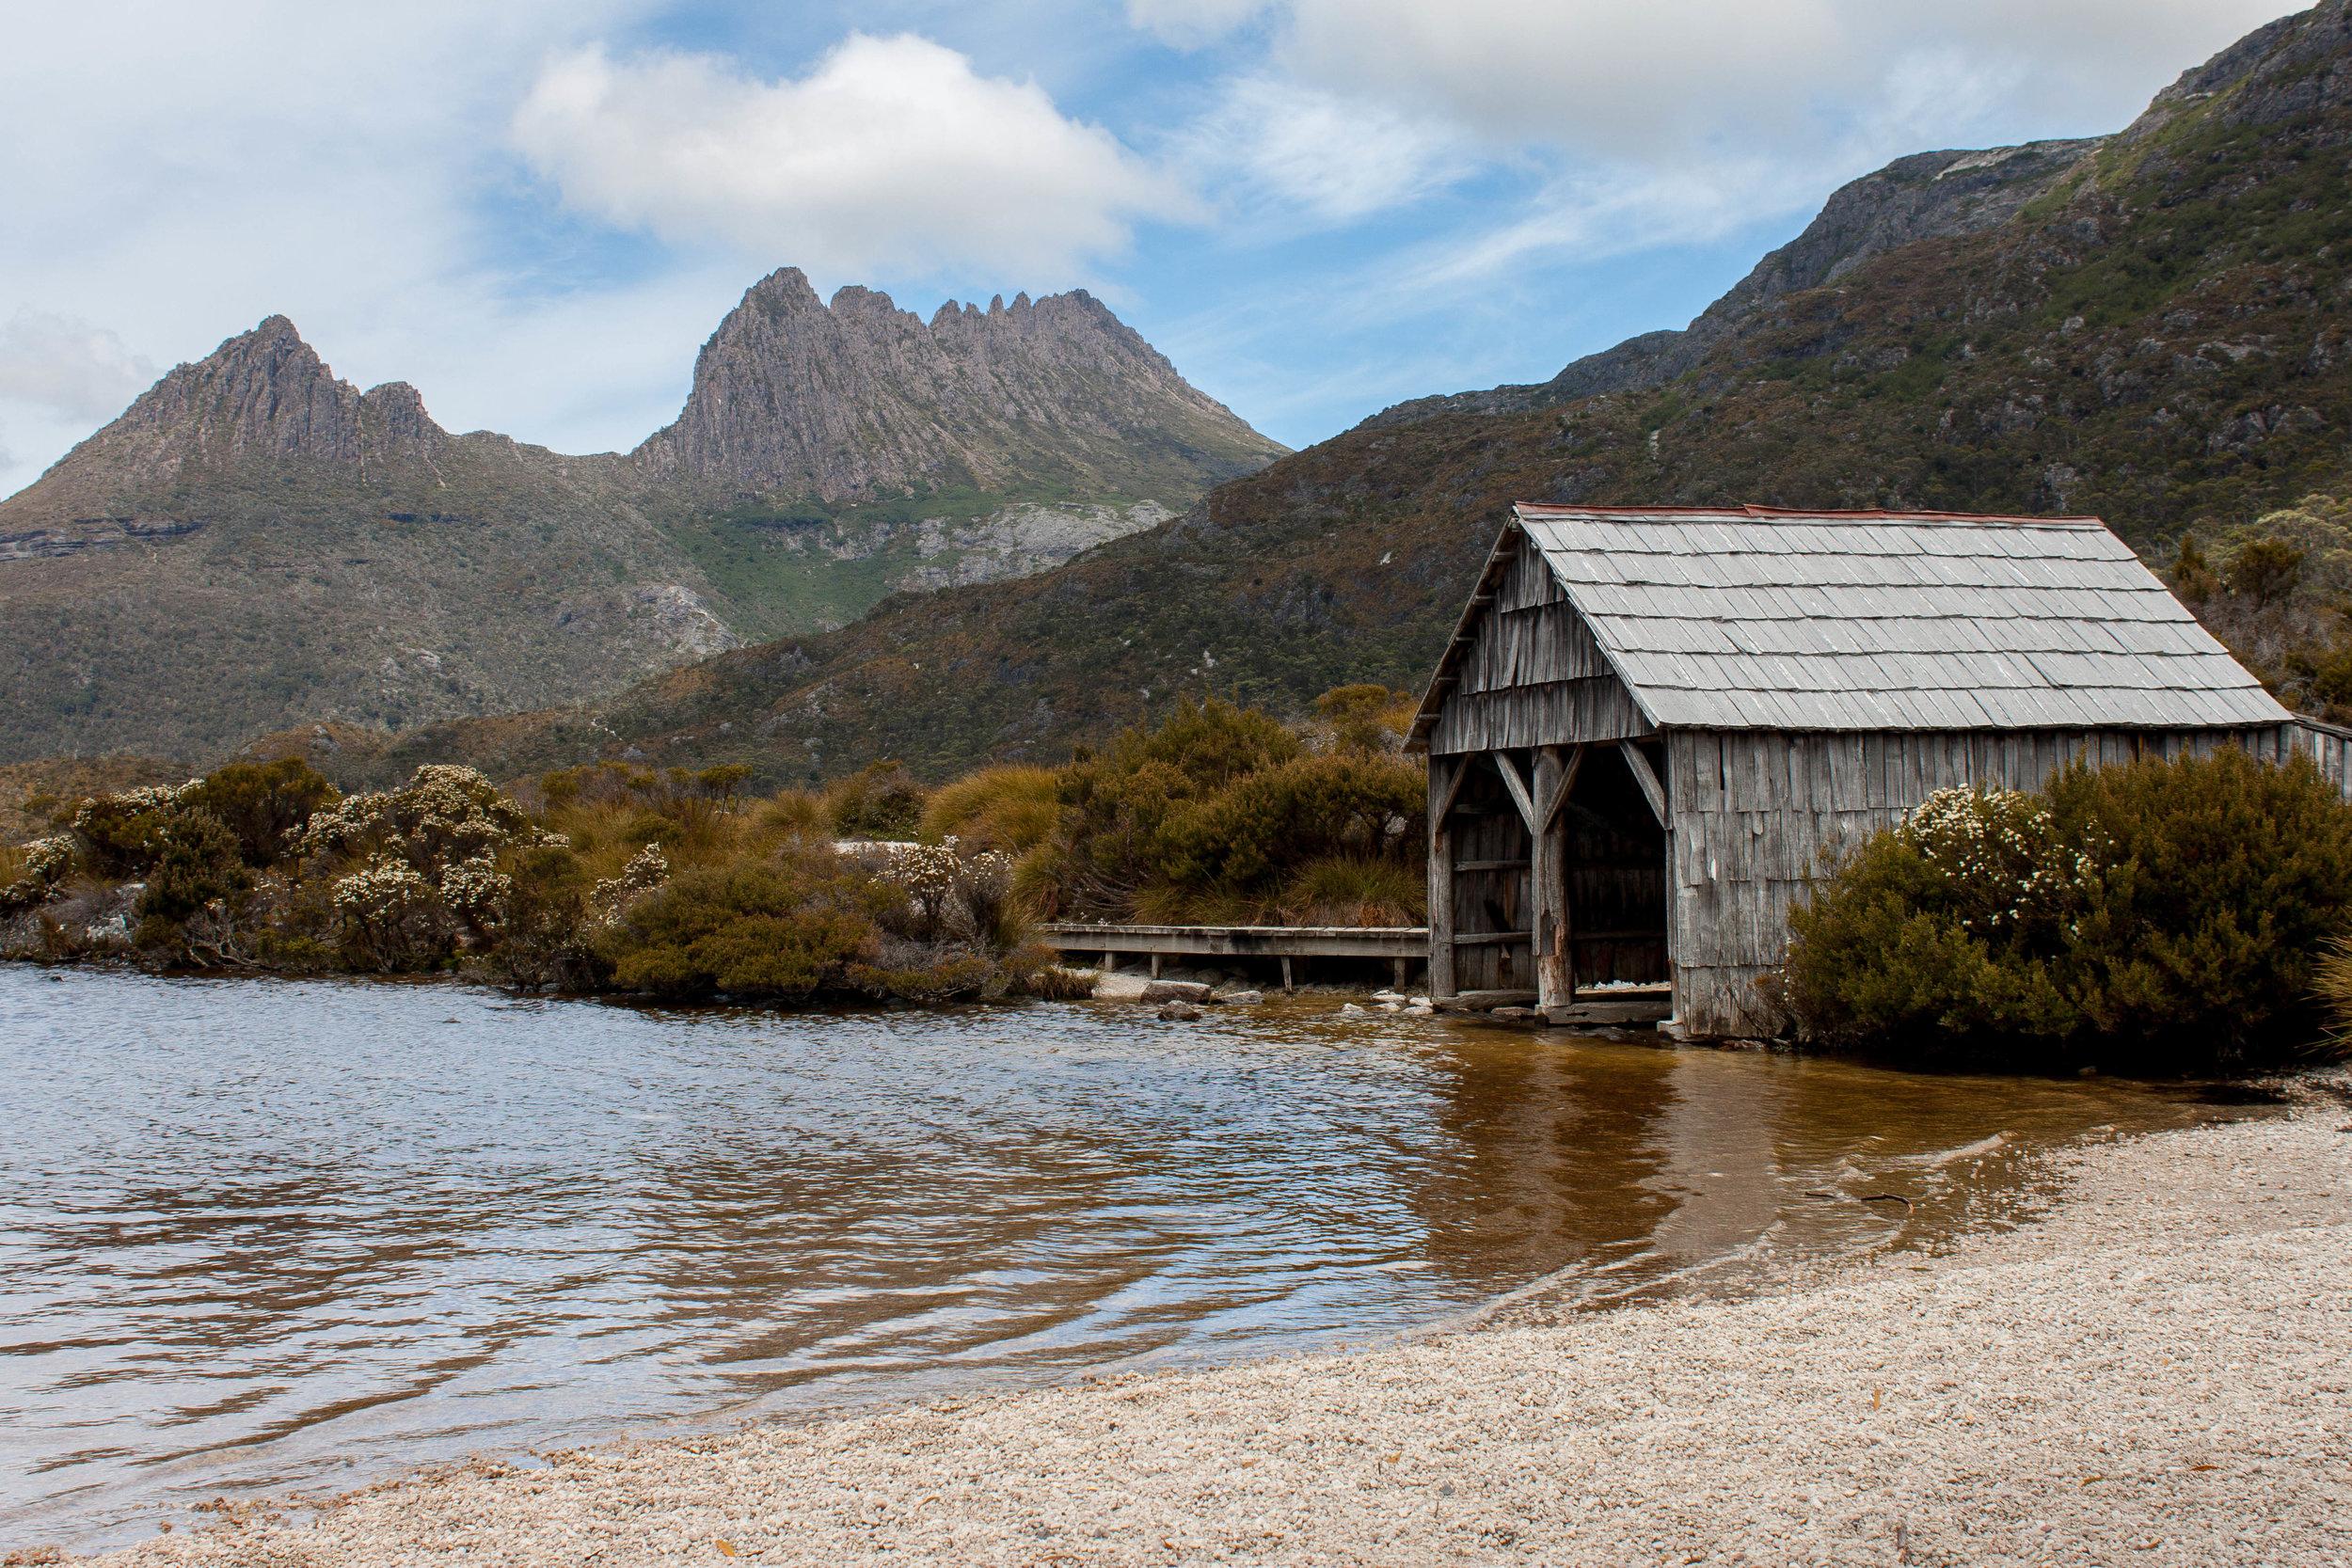 042 Tasmania - Cradle Mountain - Dec 2012.jpg